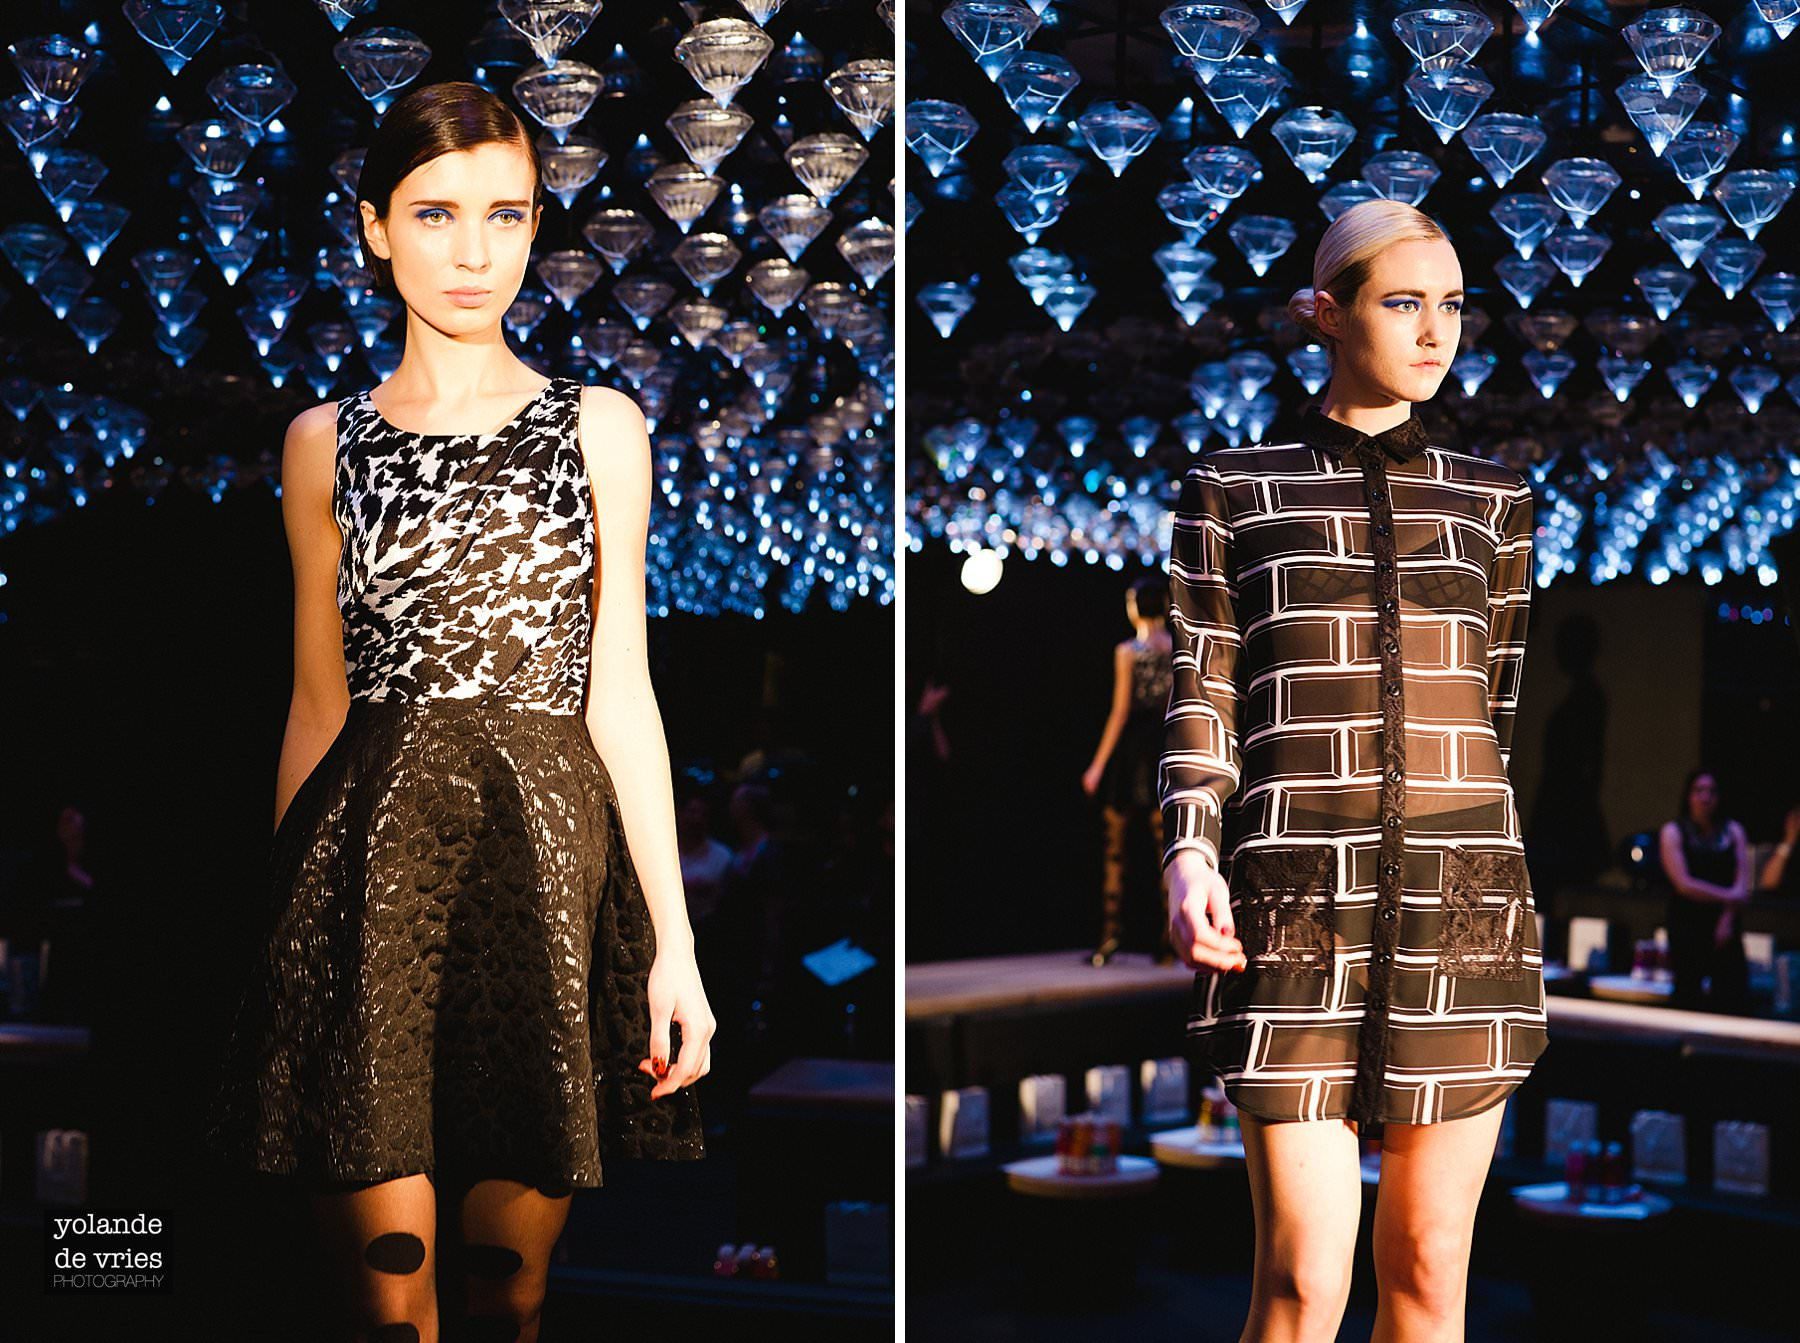 Olivia-Rubin-SS11-London-Fashion-Week-1497.jpg